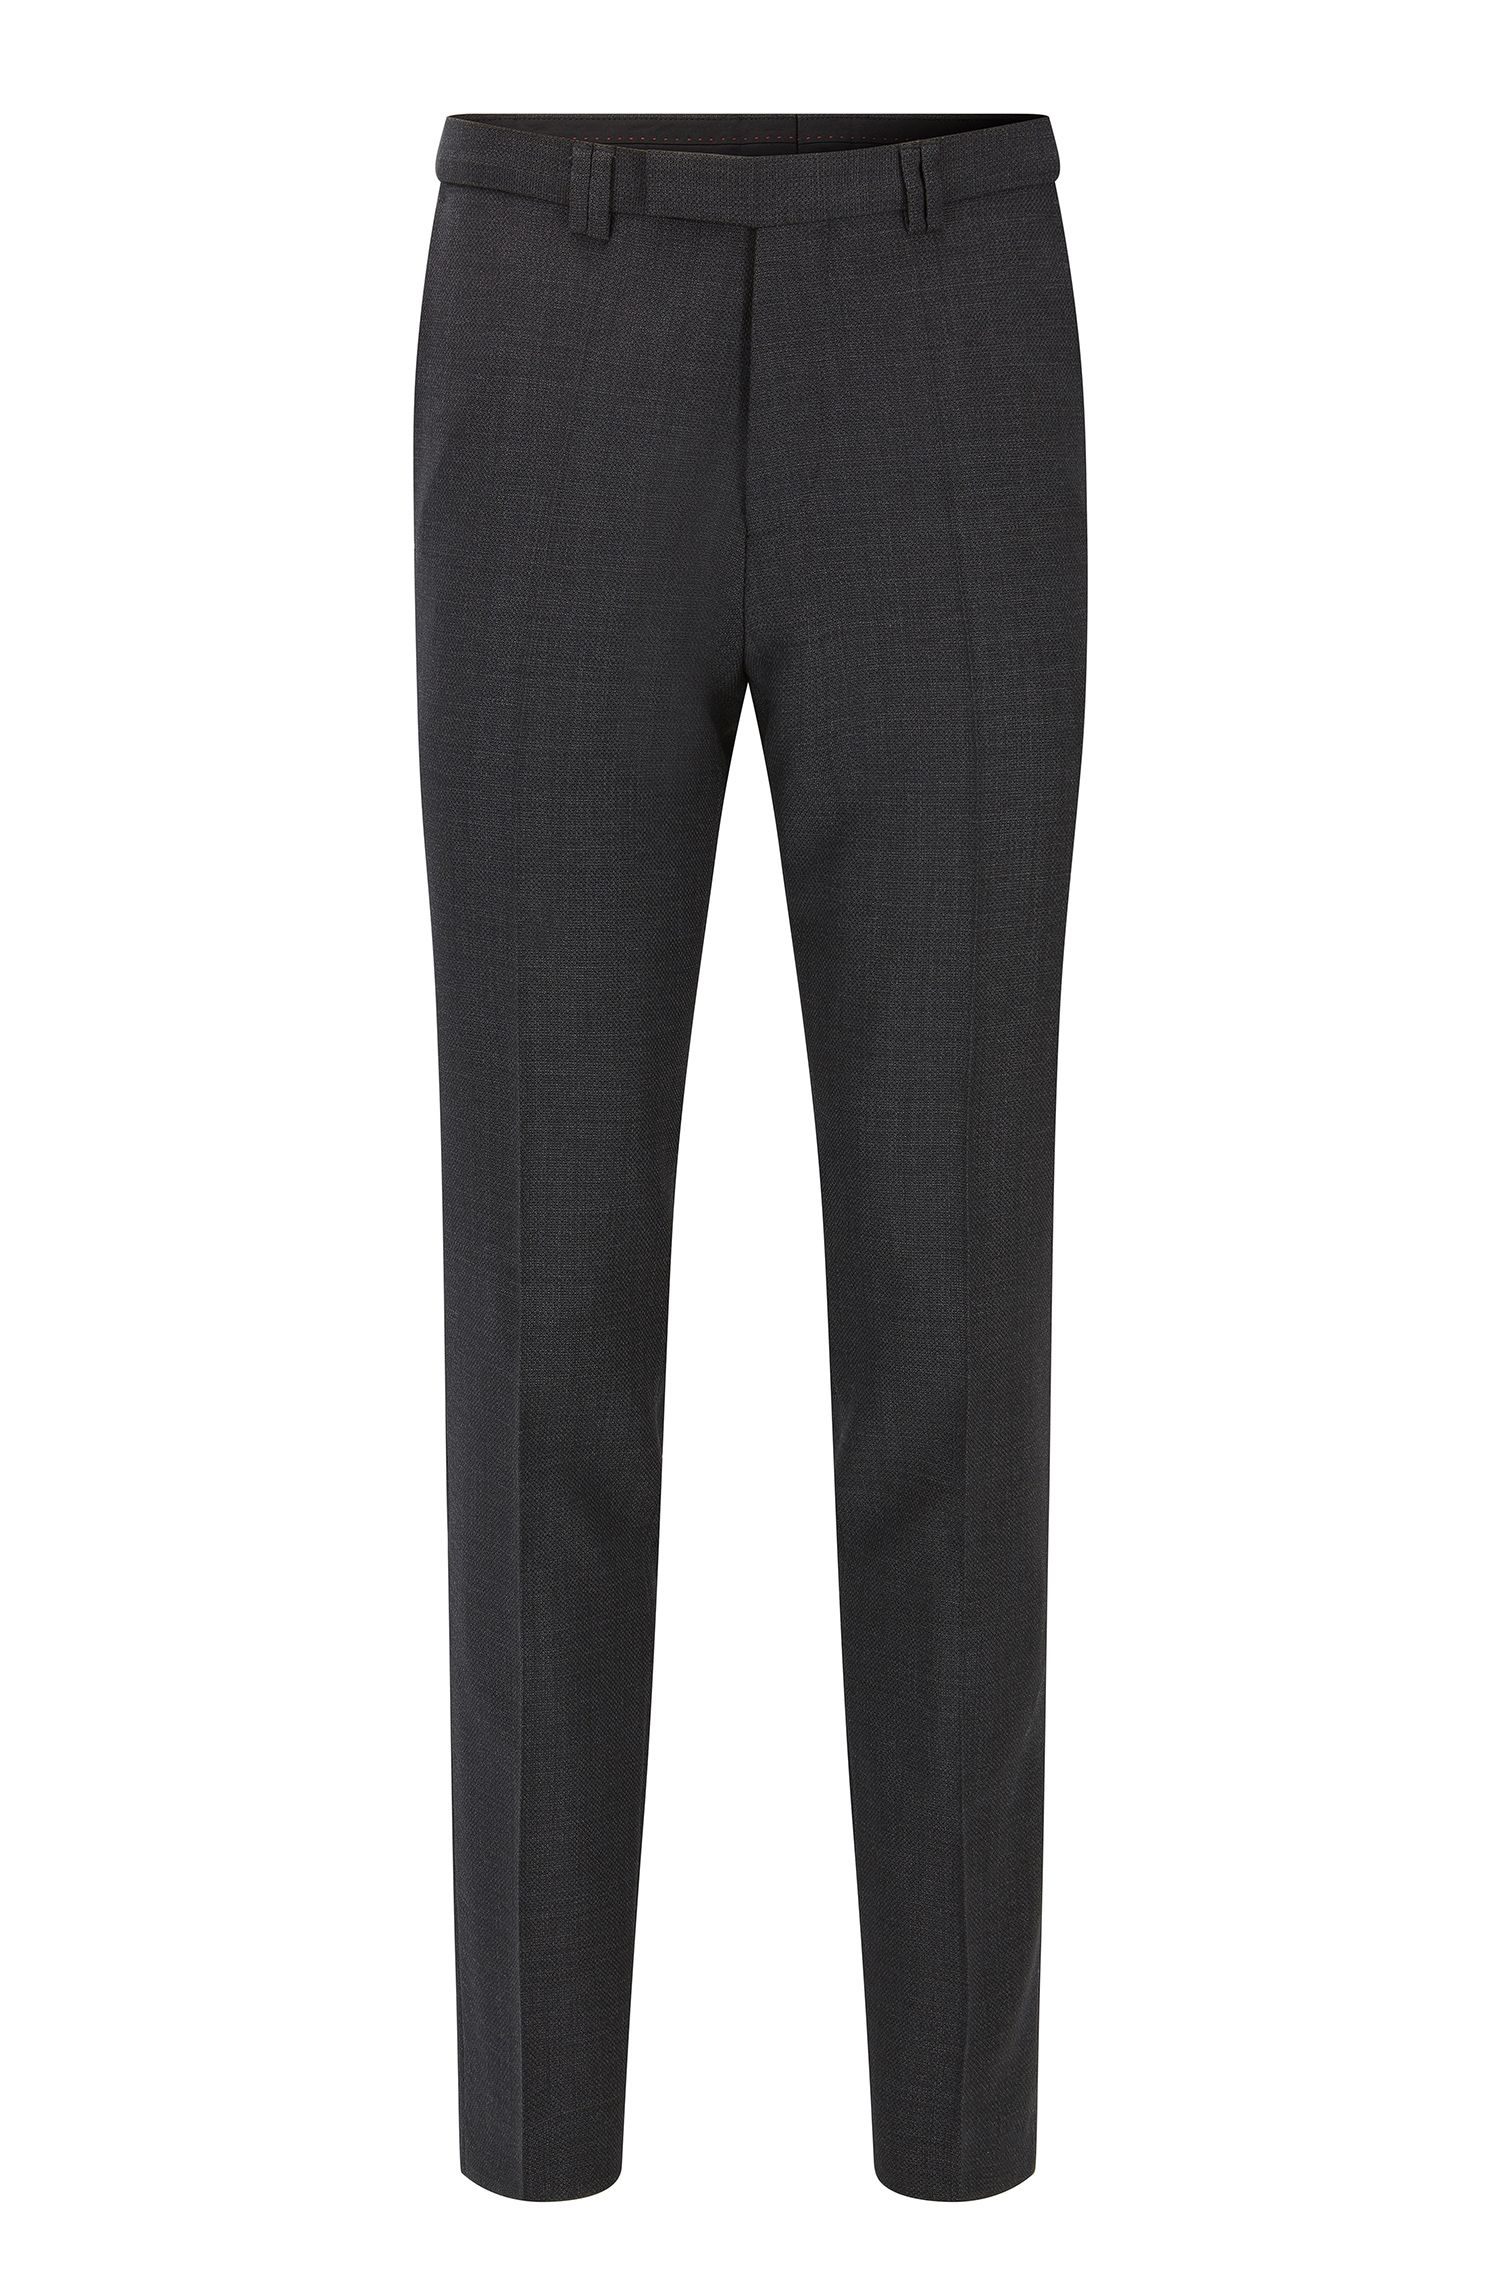 Gemusterte Extra-Slim-Fit-Hose aus Schurwolle